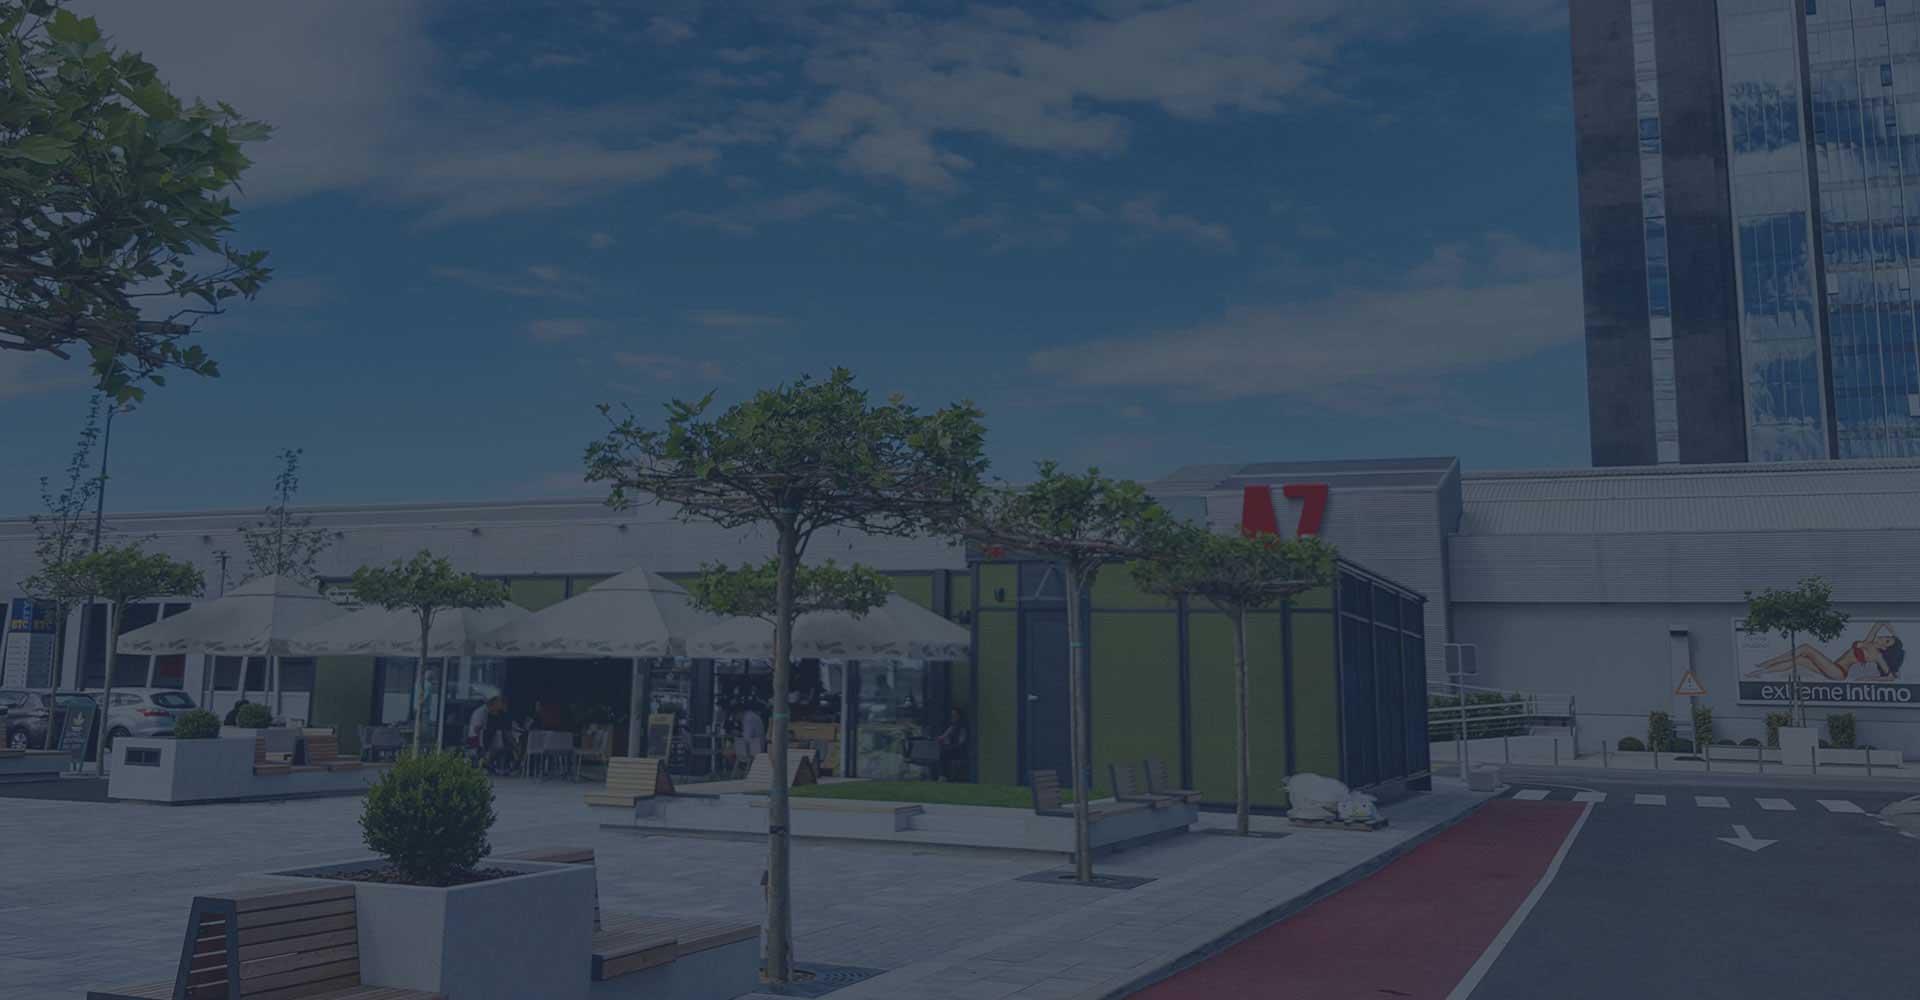 btc prekybos centras slovėnija